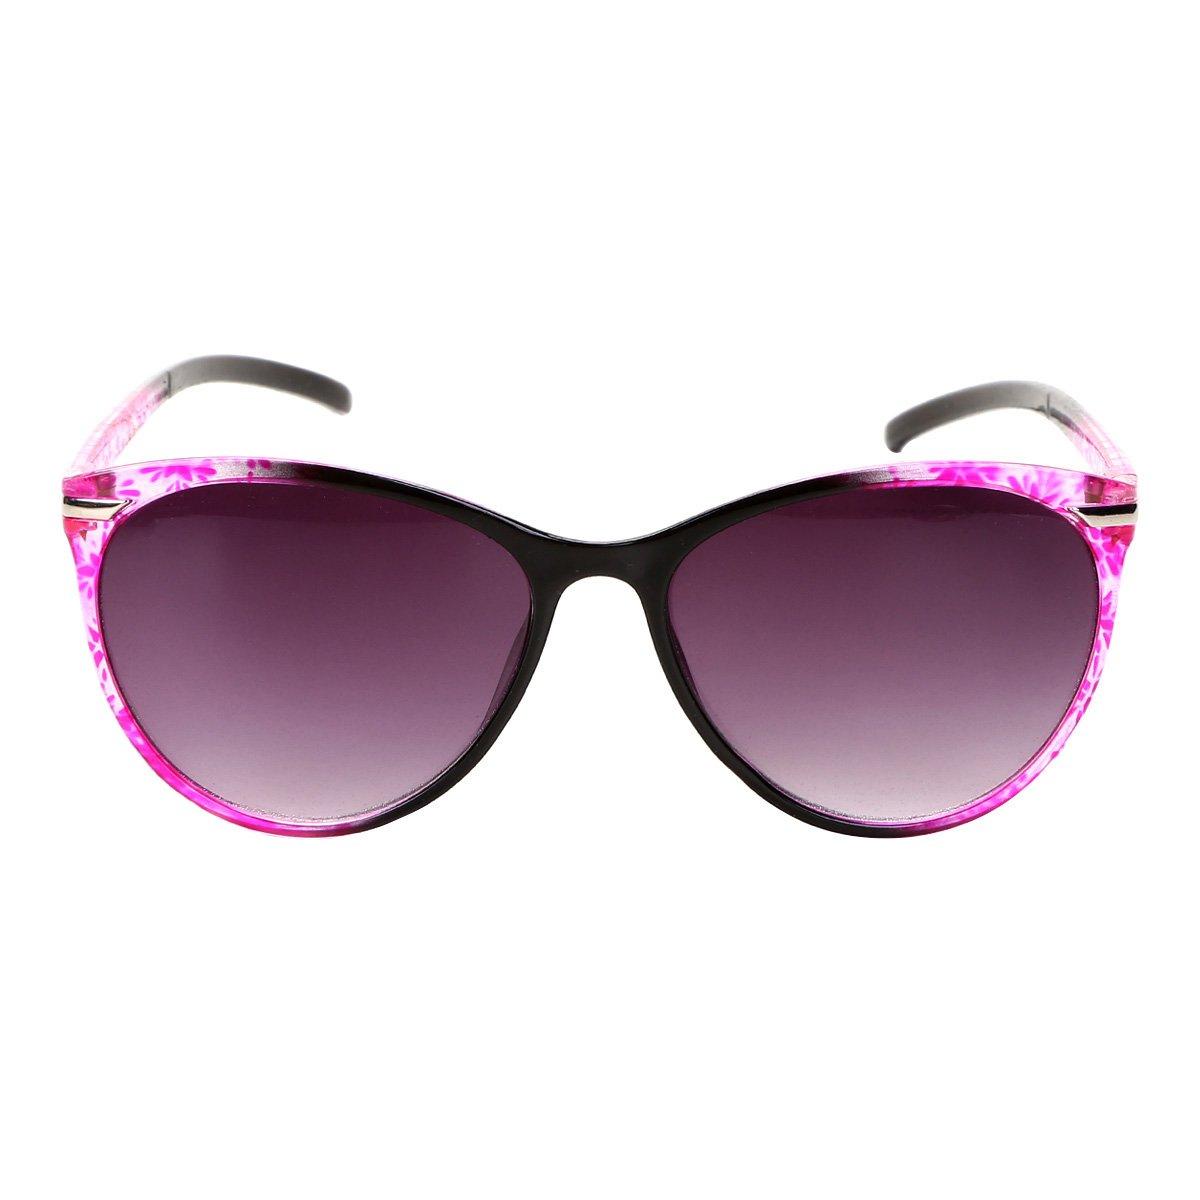 a8d78819e43cd Óculos de Sol Redondo King One Estampado Floral Feminino - Compre ...